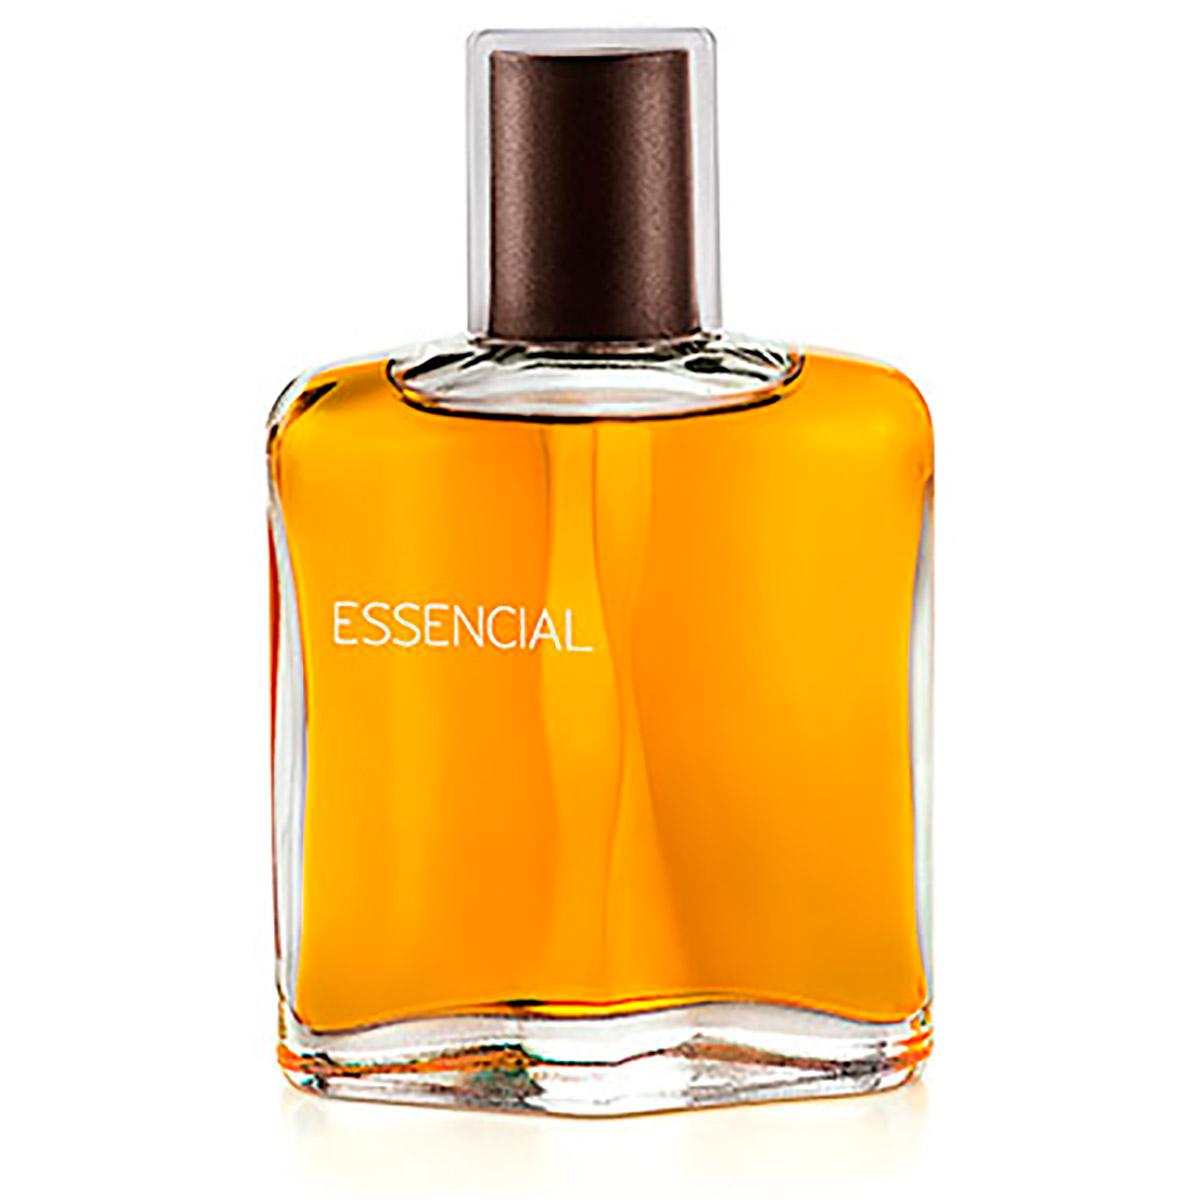 Deo Parfum Essencial Masculino - 100ml - 41806